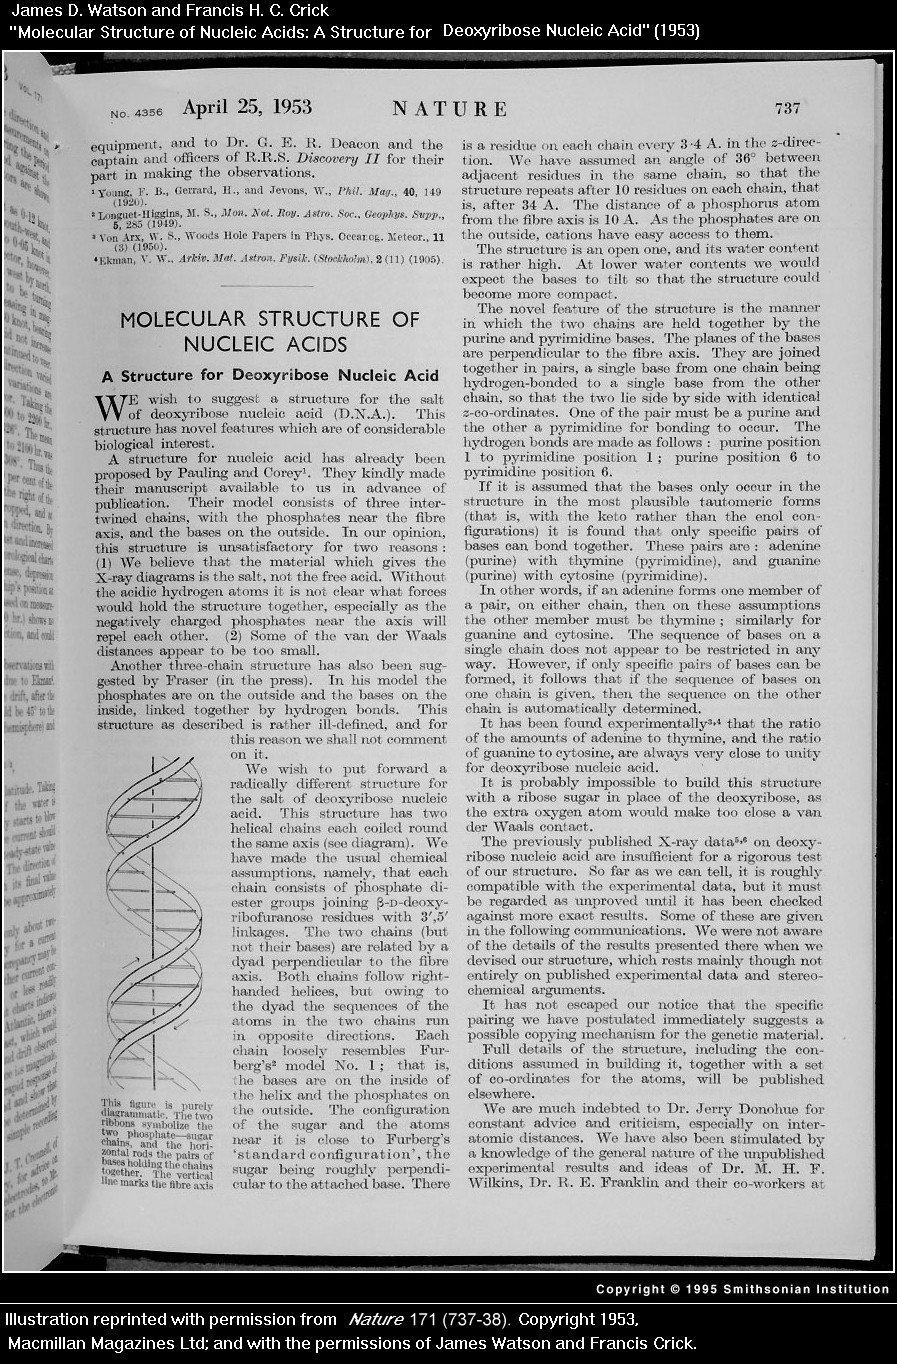 Watson and Crick's Nature paper, Arthur Kornberg